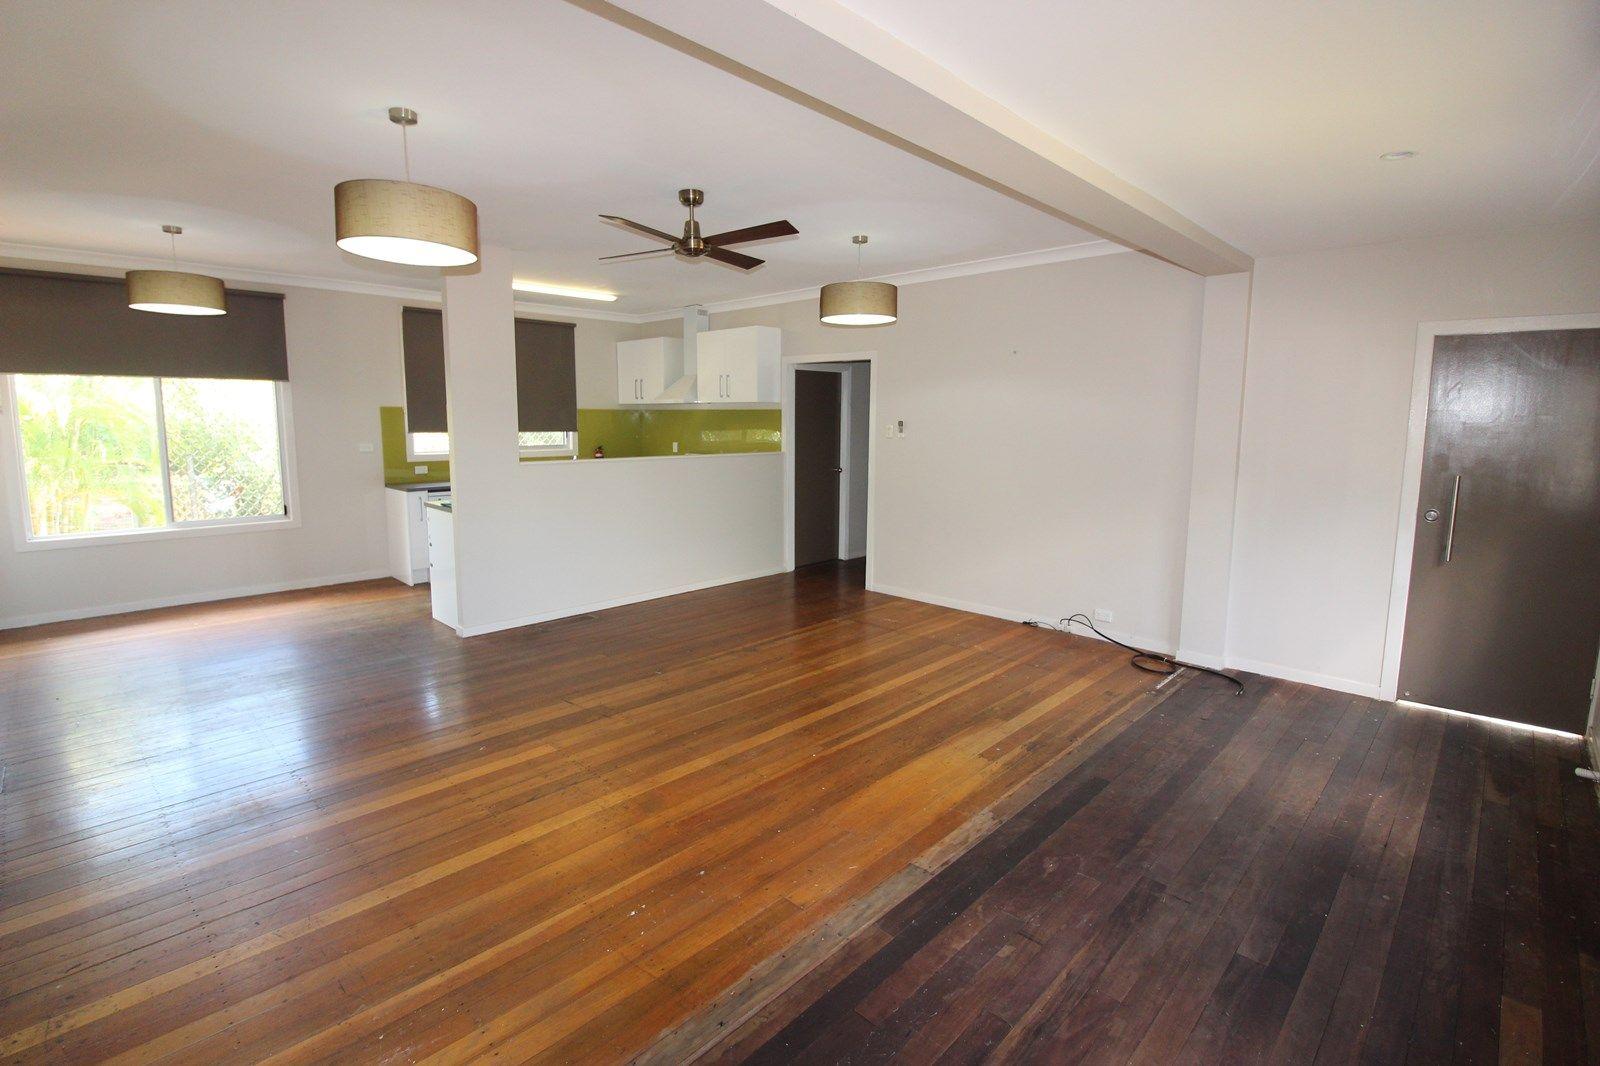 16 Opal St, Mount Isa QLD 4825, Image 1